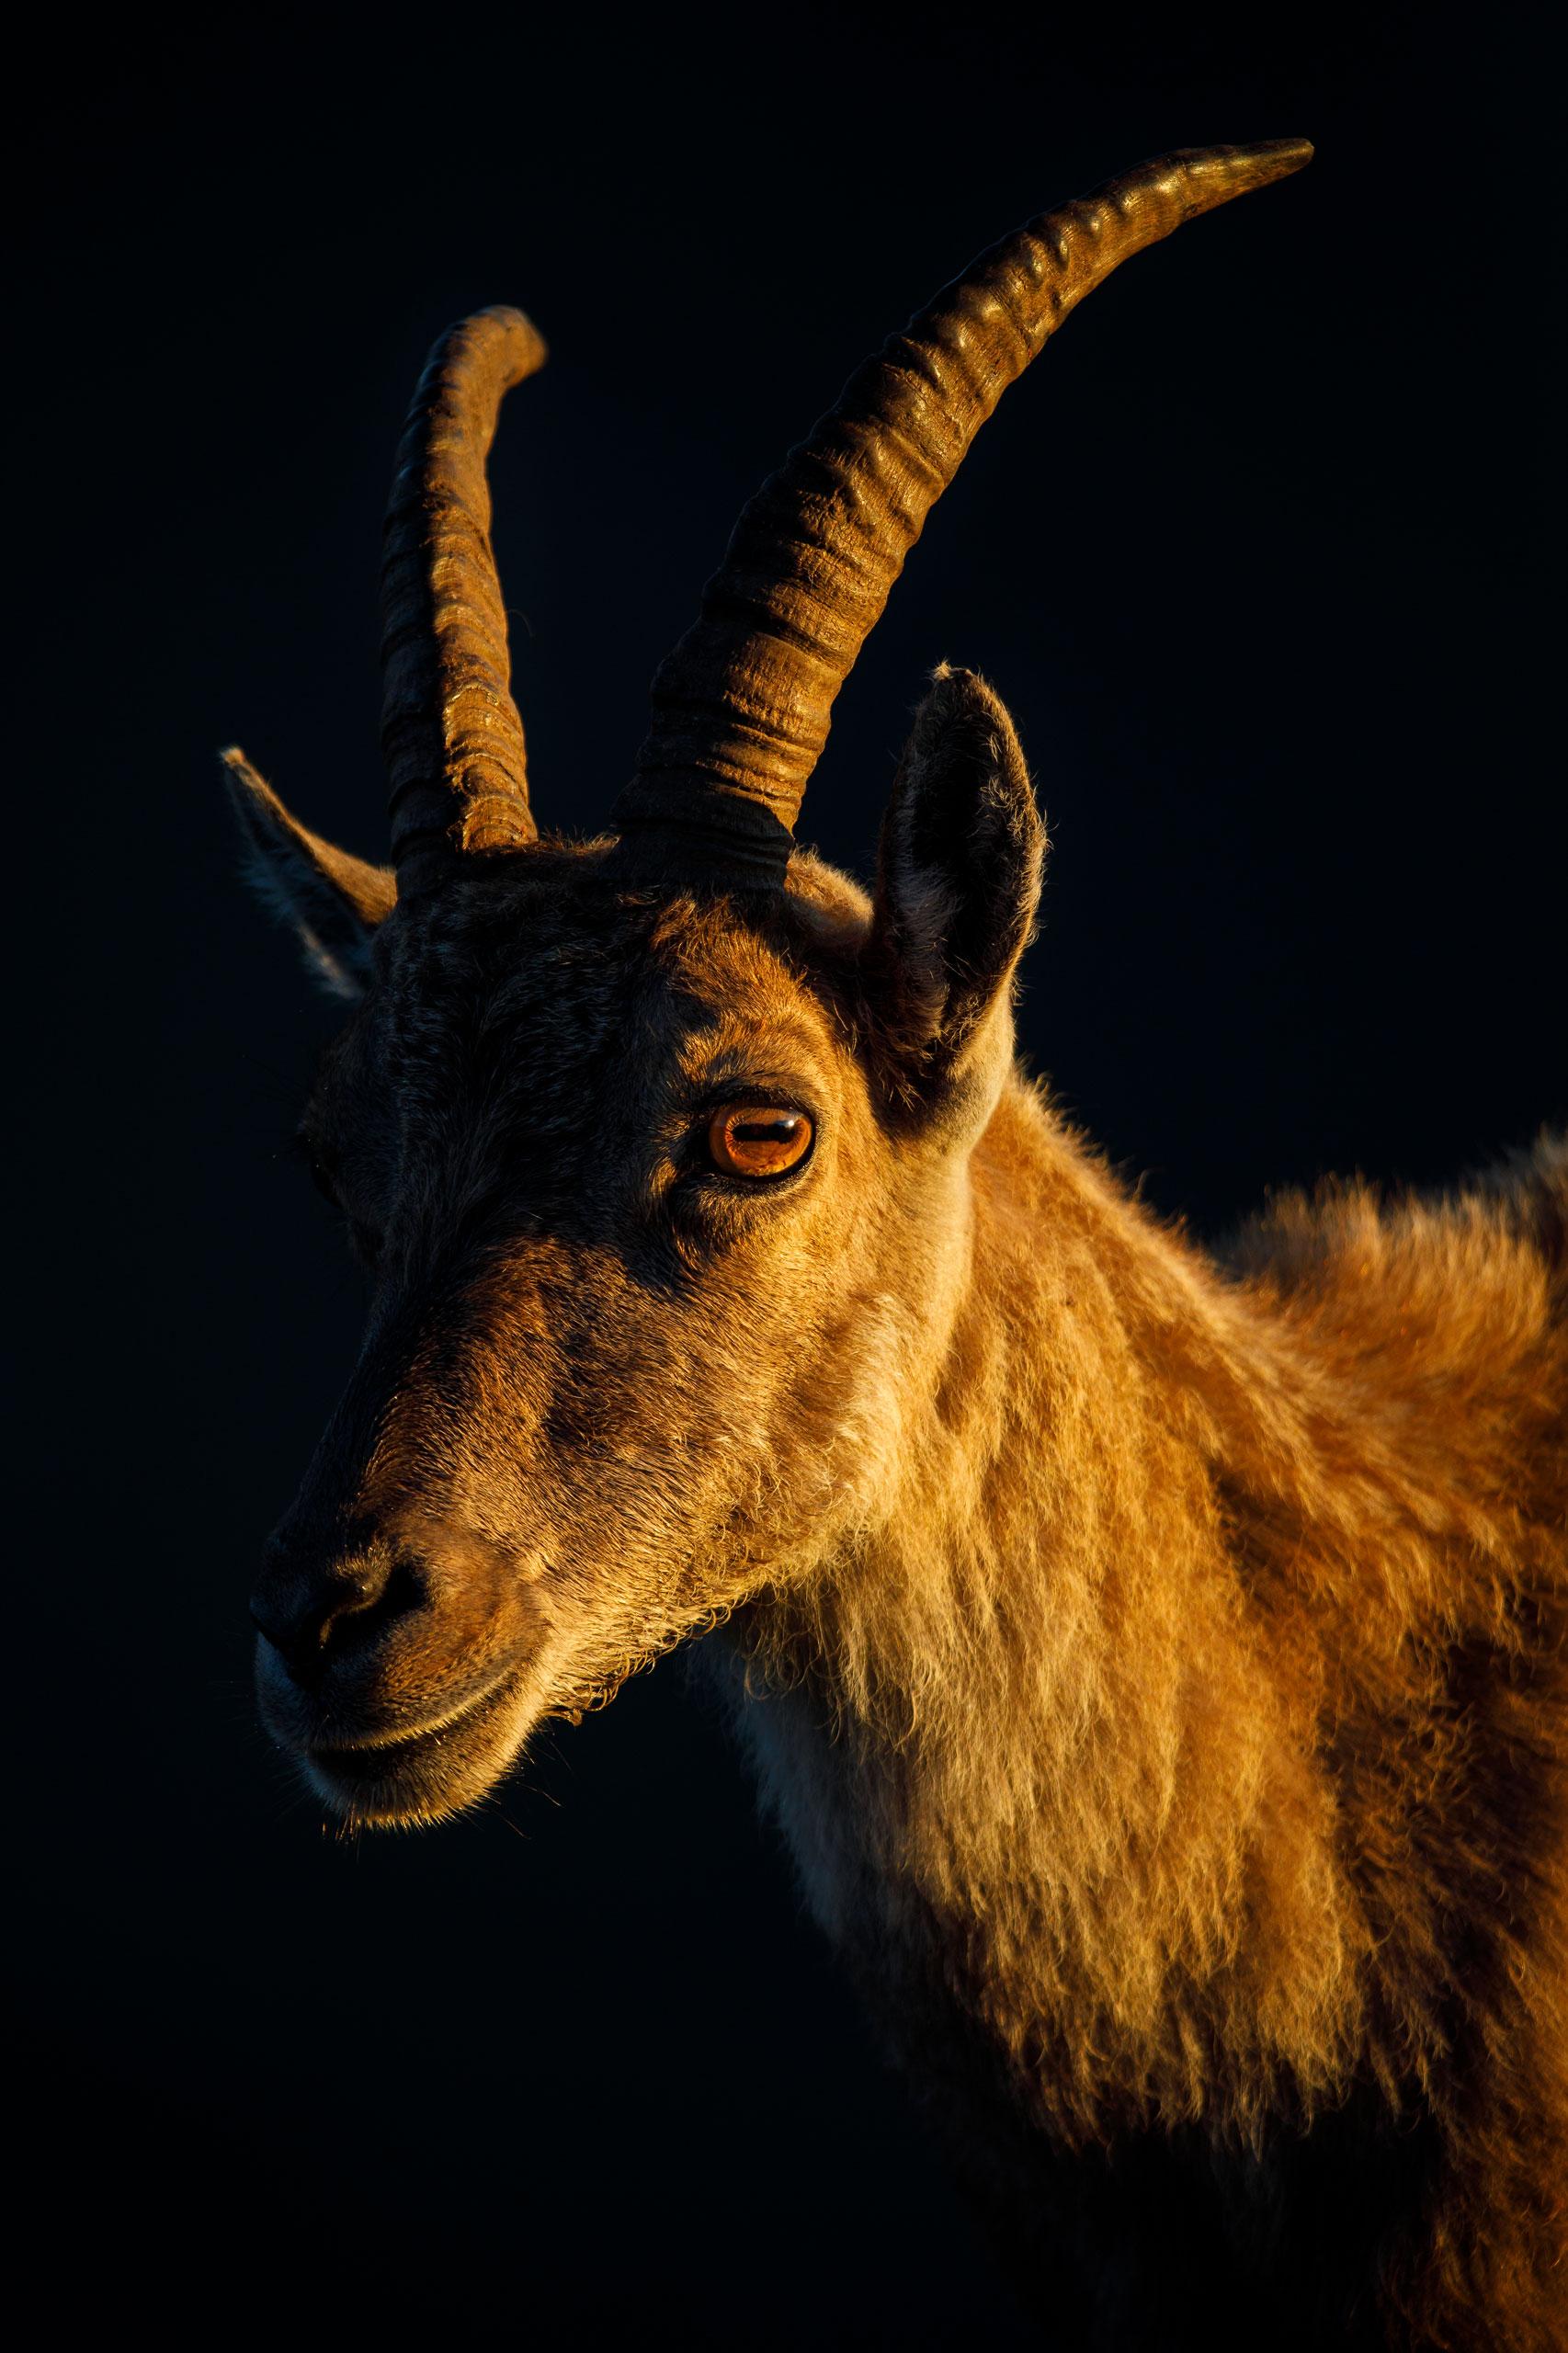 Tom_Schueler_Fotografie_Wildlife_Mammals_6